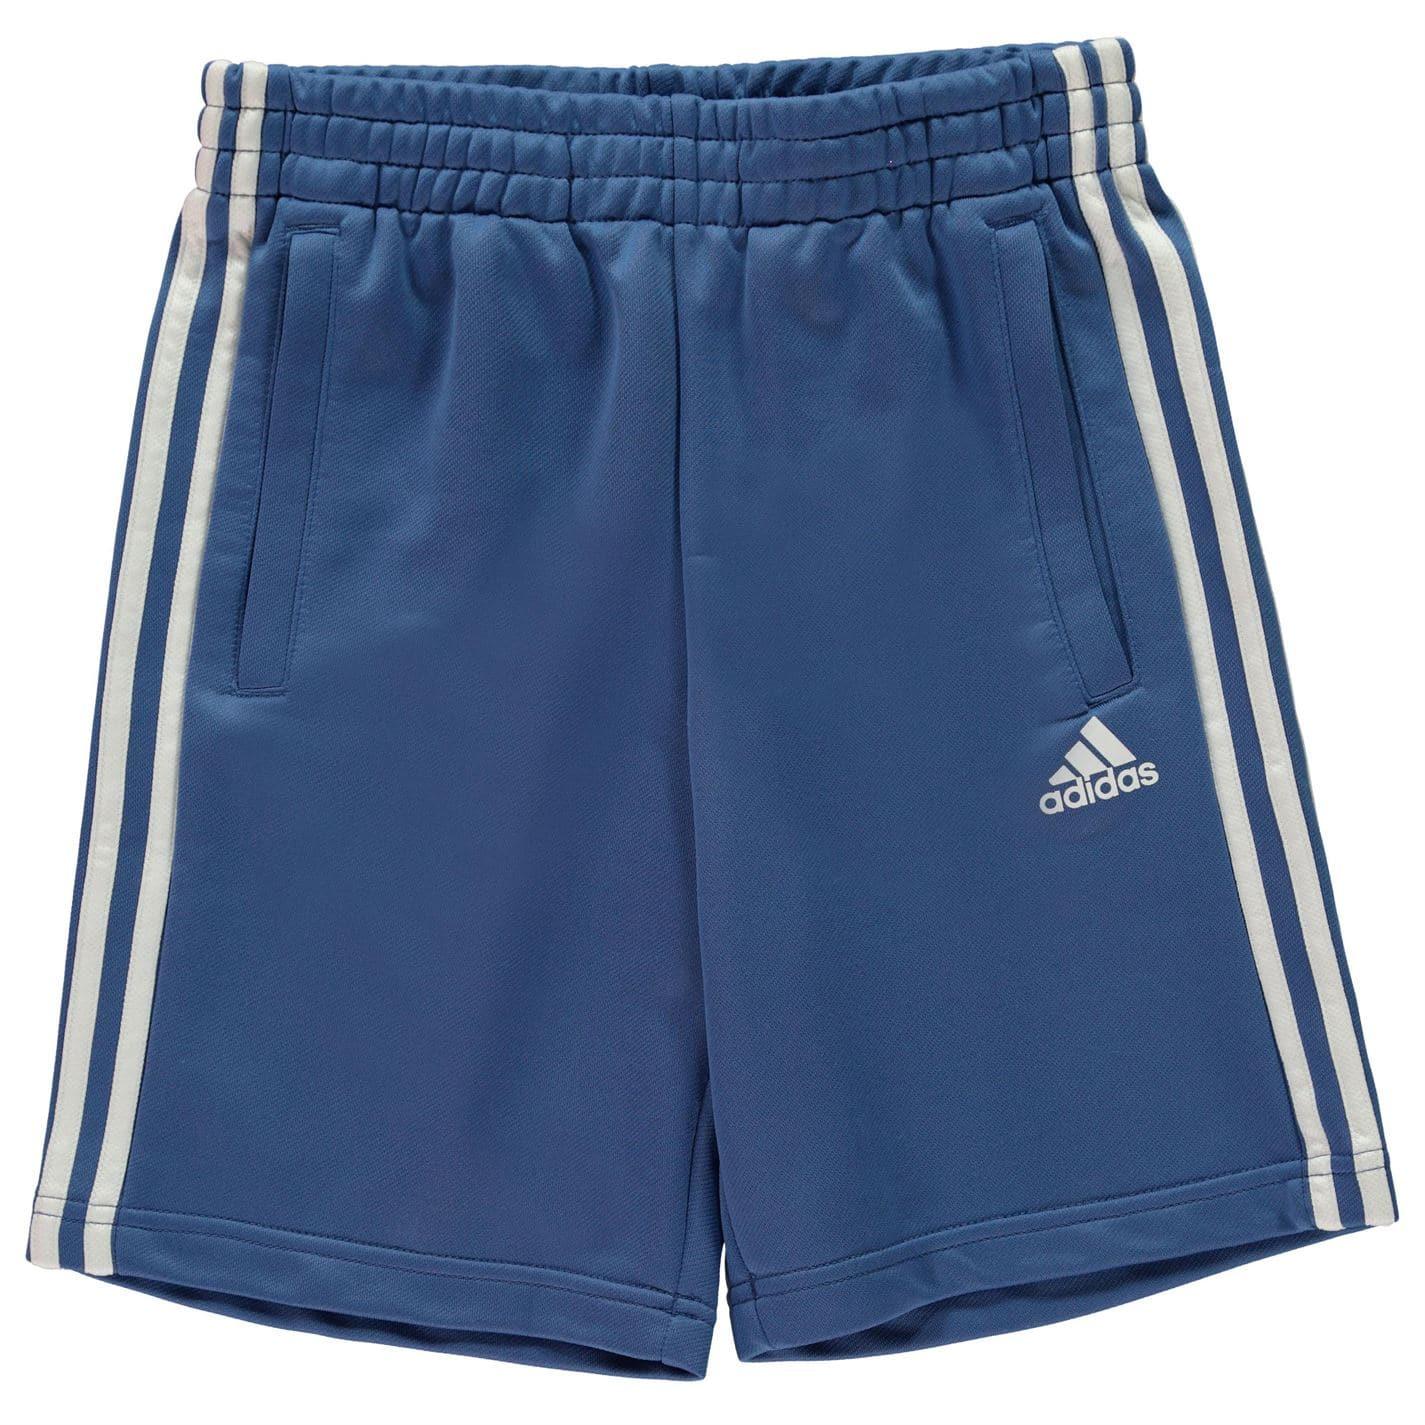 adidas 3S Knit Shorts Junior Boys